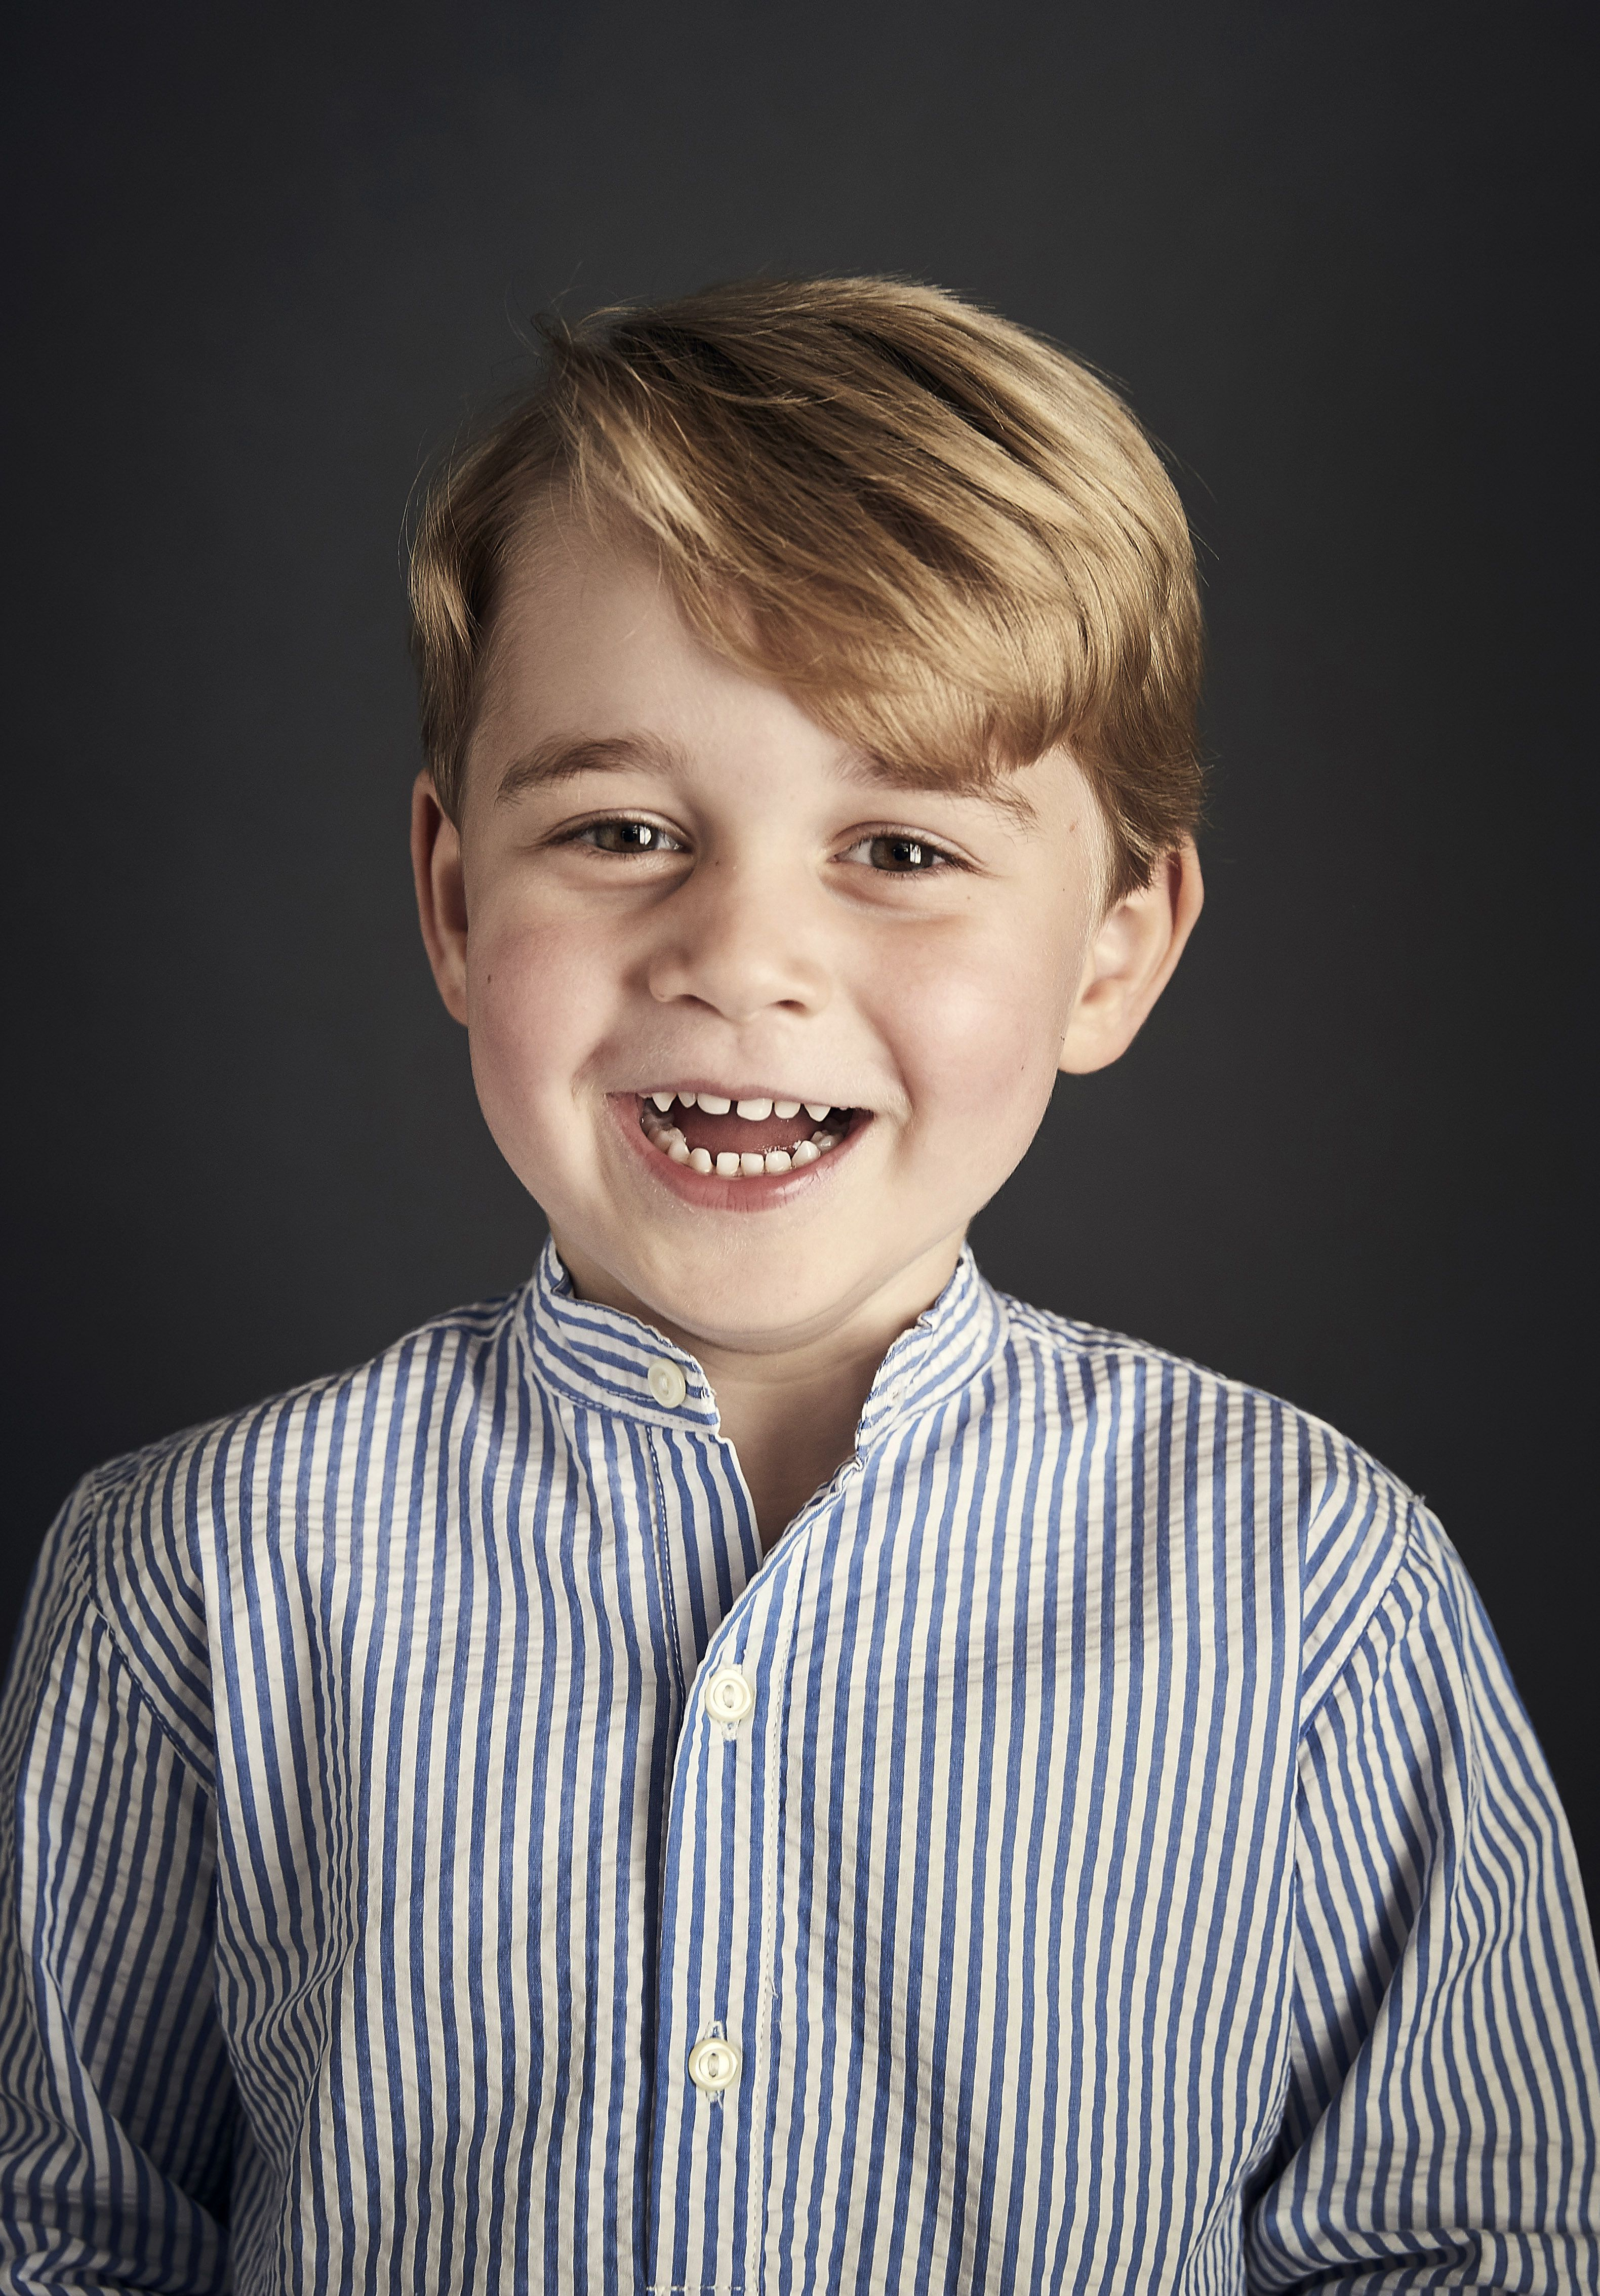 Prince George of Cambridge Turns 4